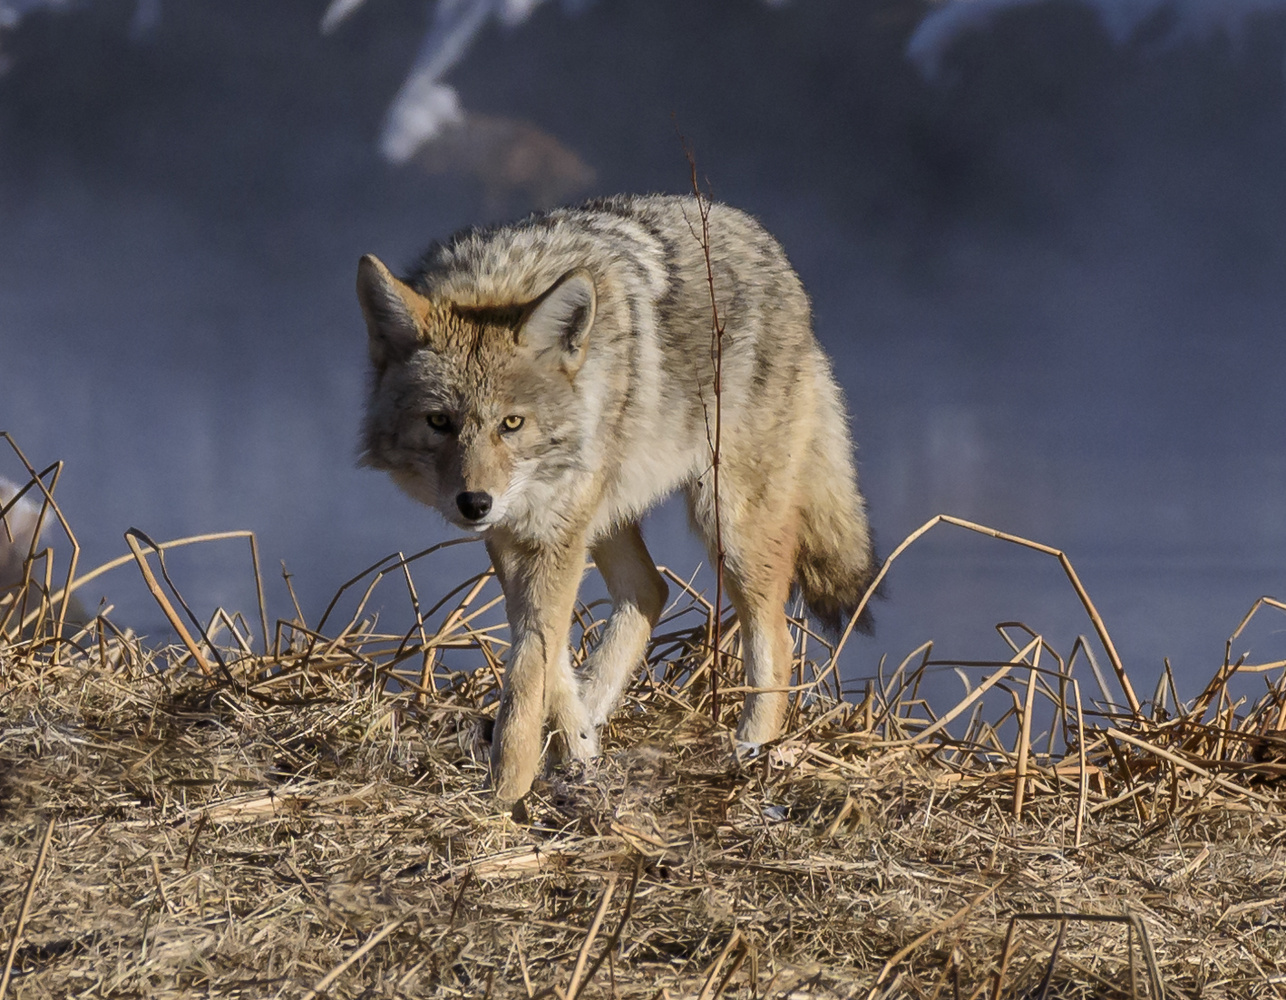 Coyote in Yellowstone by John Nicholson